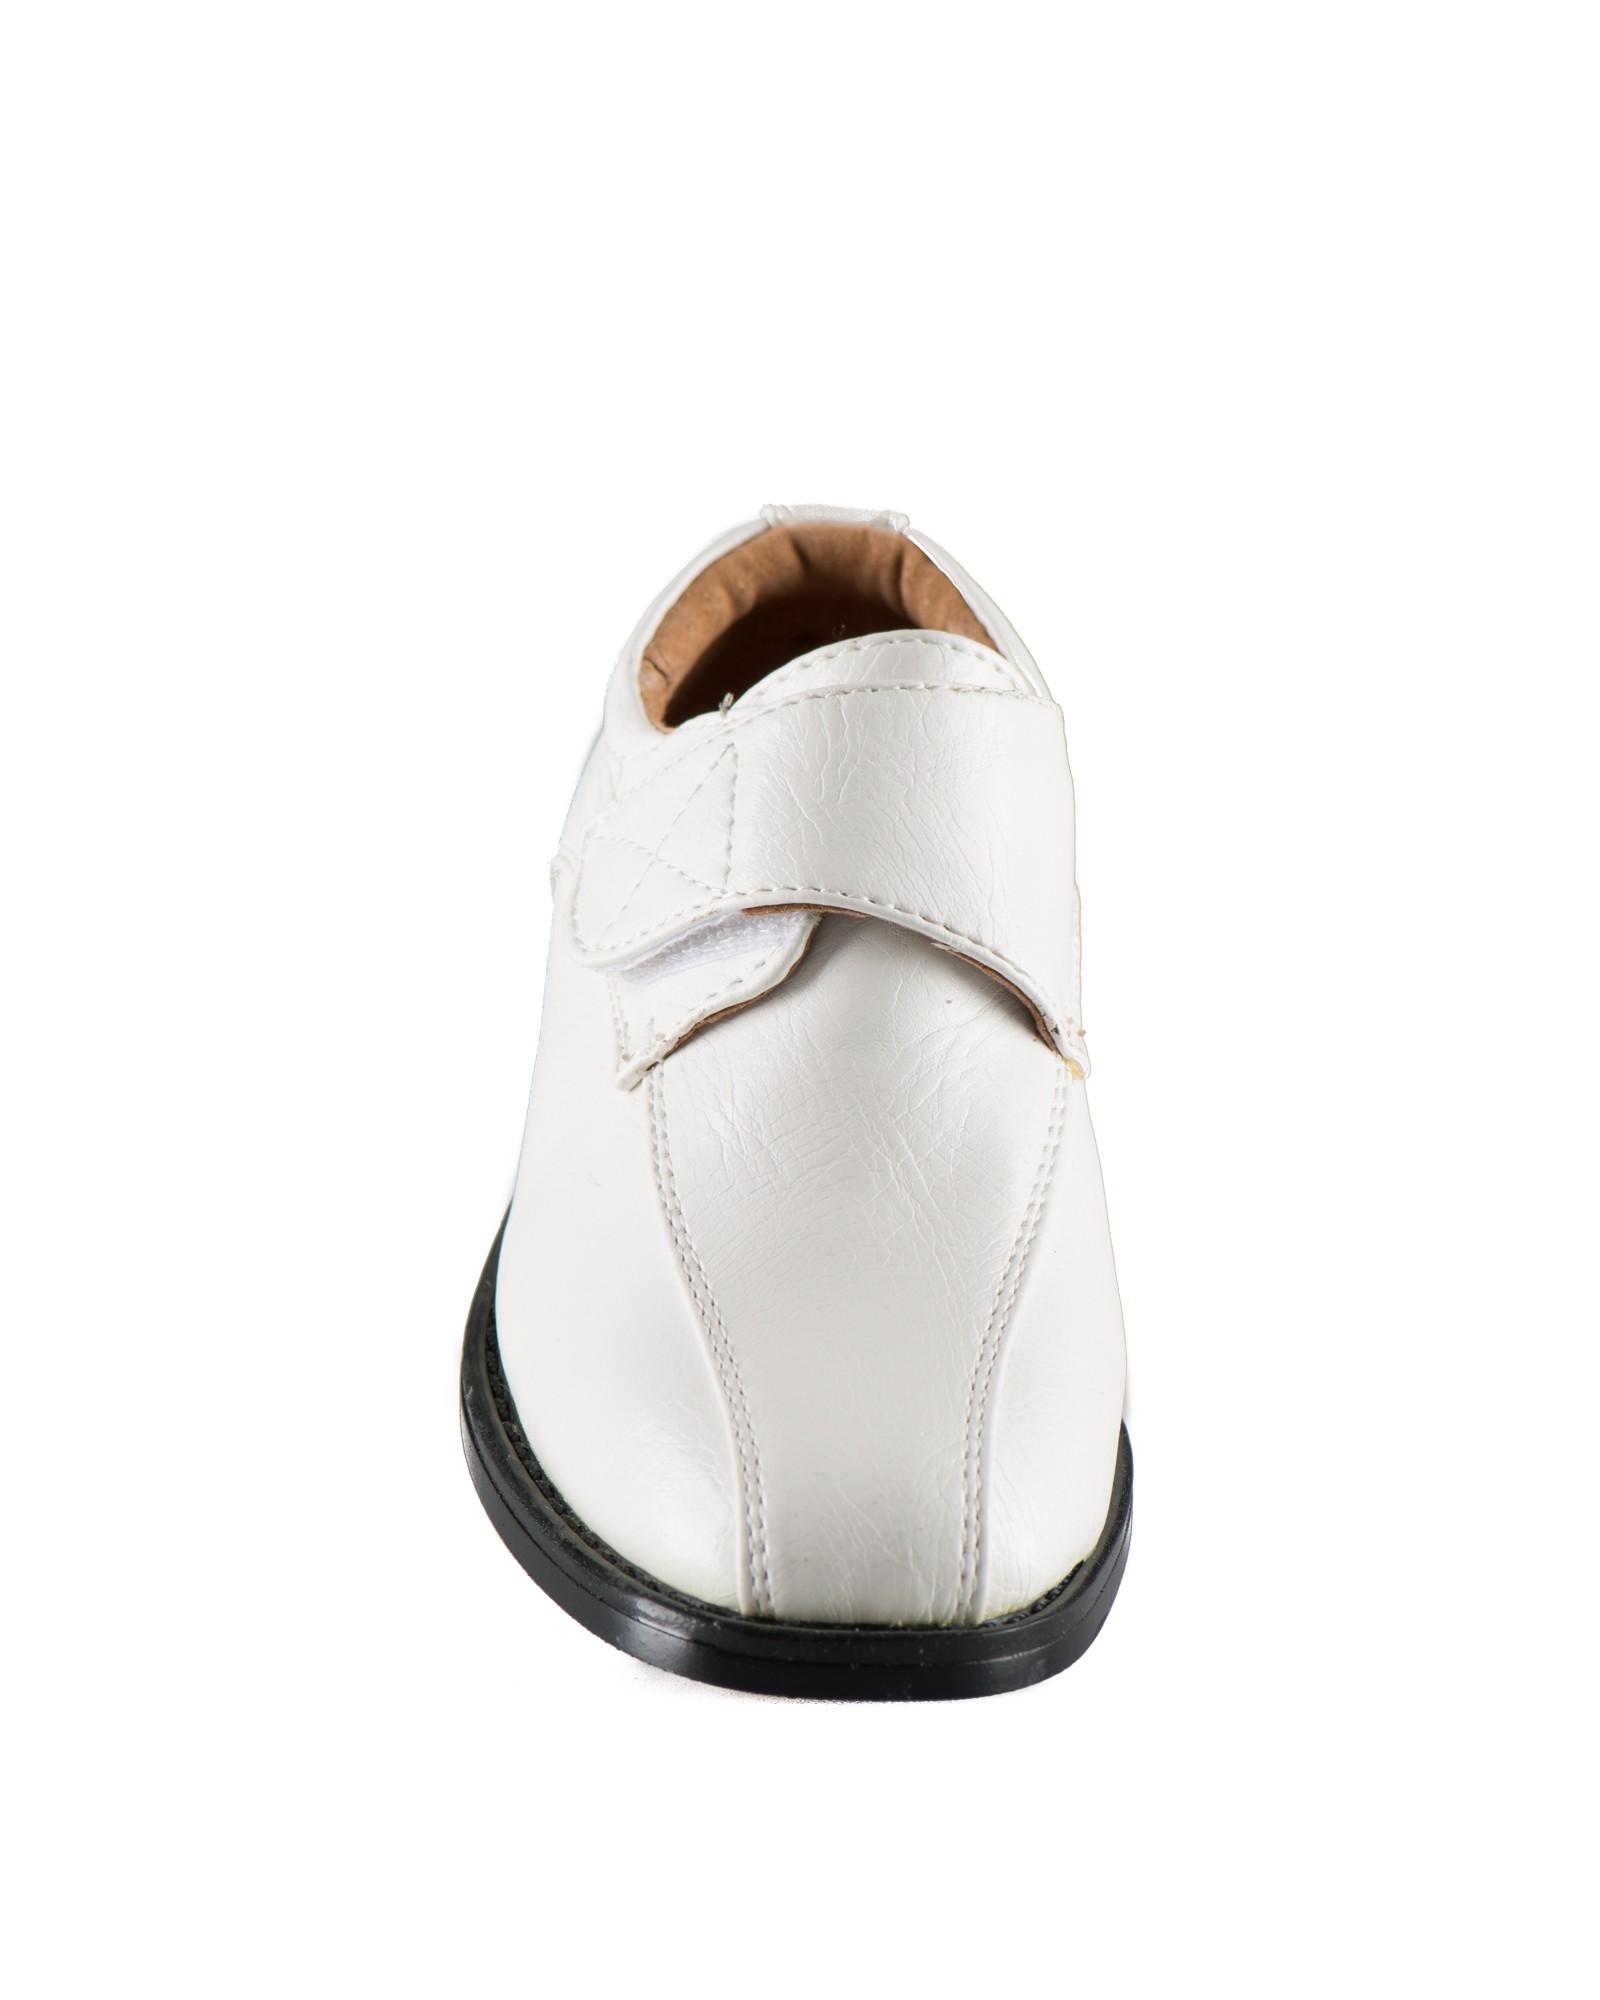 off white bruidsjonkersschoenen met klittenband